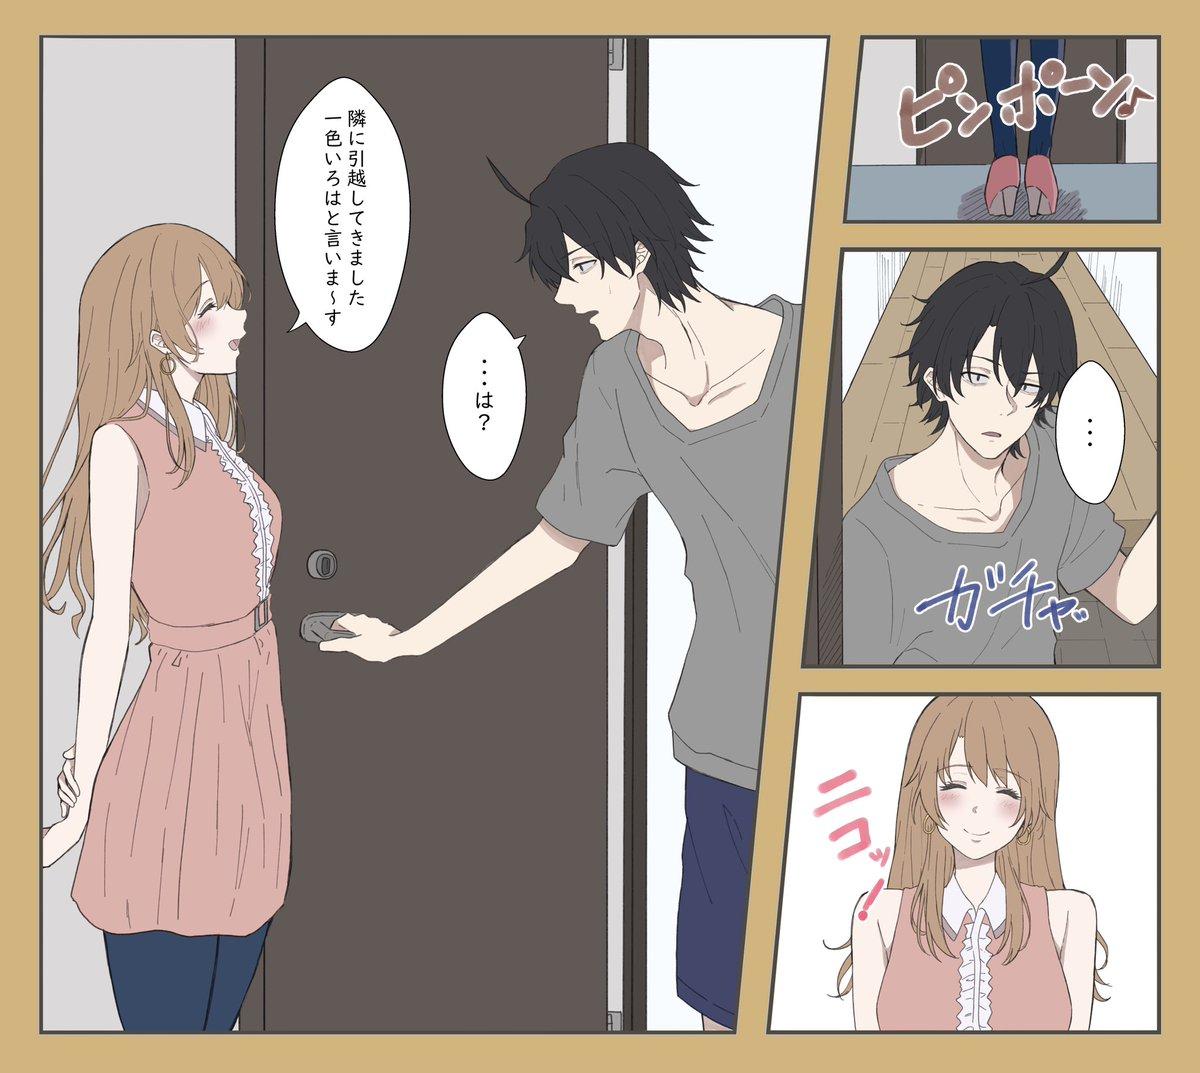 〜if物語〜  「部屋が隣で半同棲になってる大学生八色」